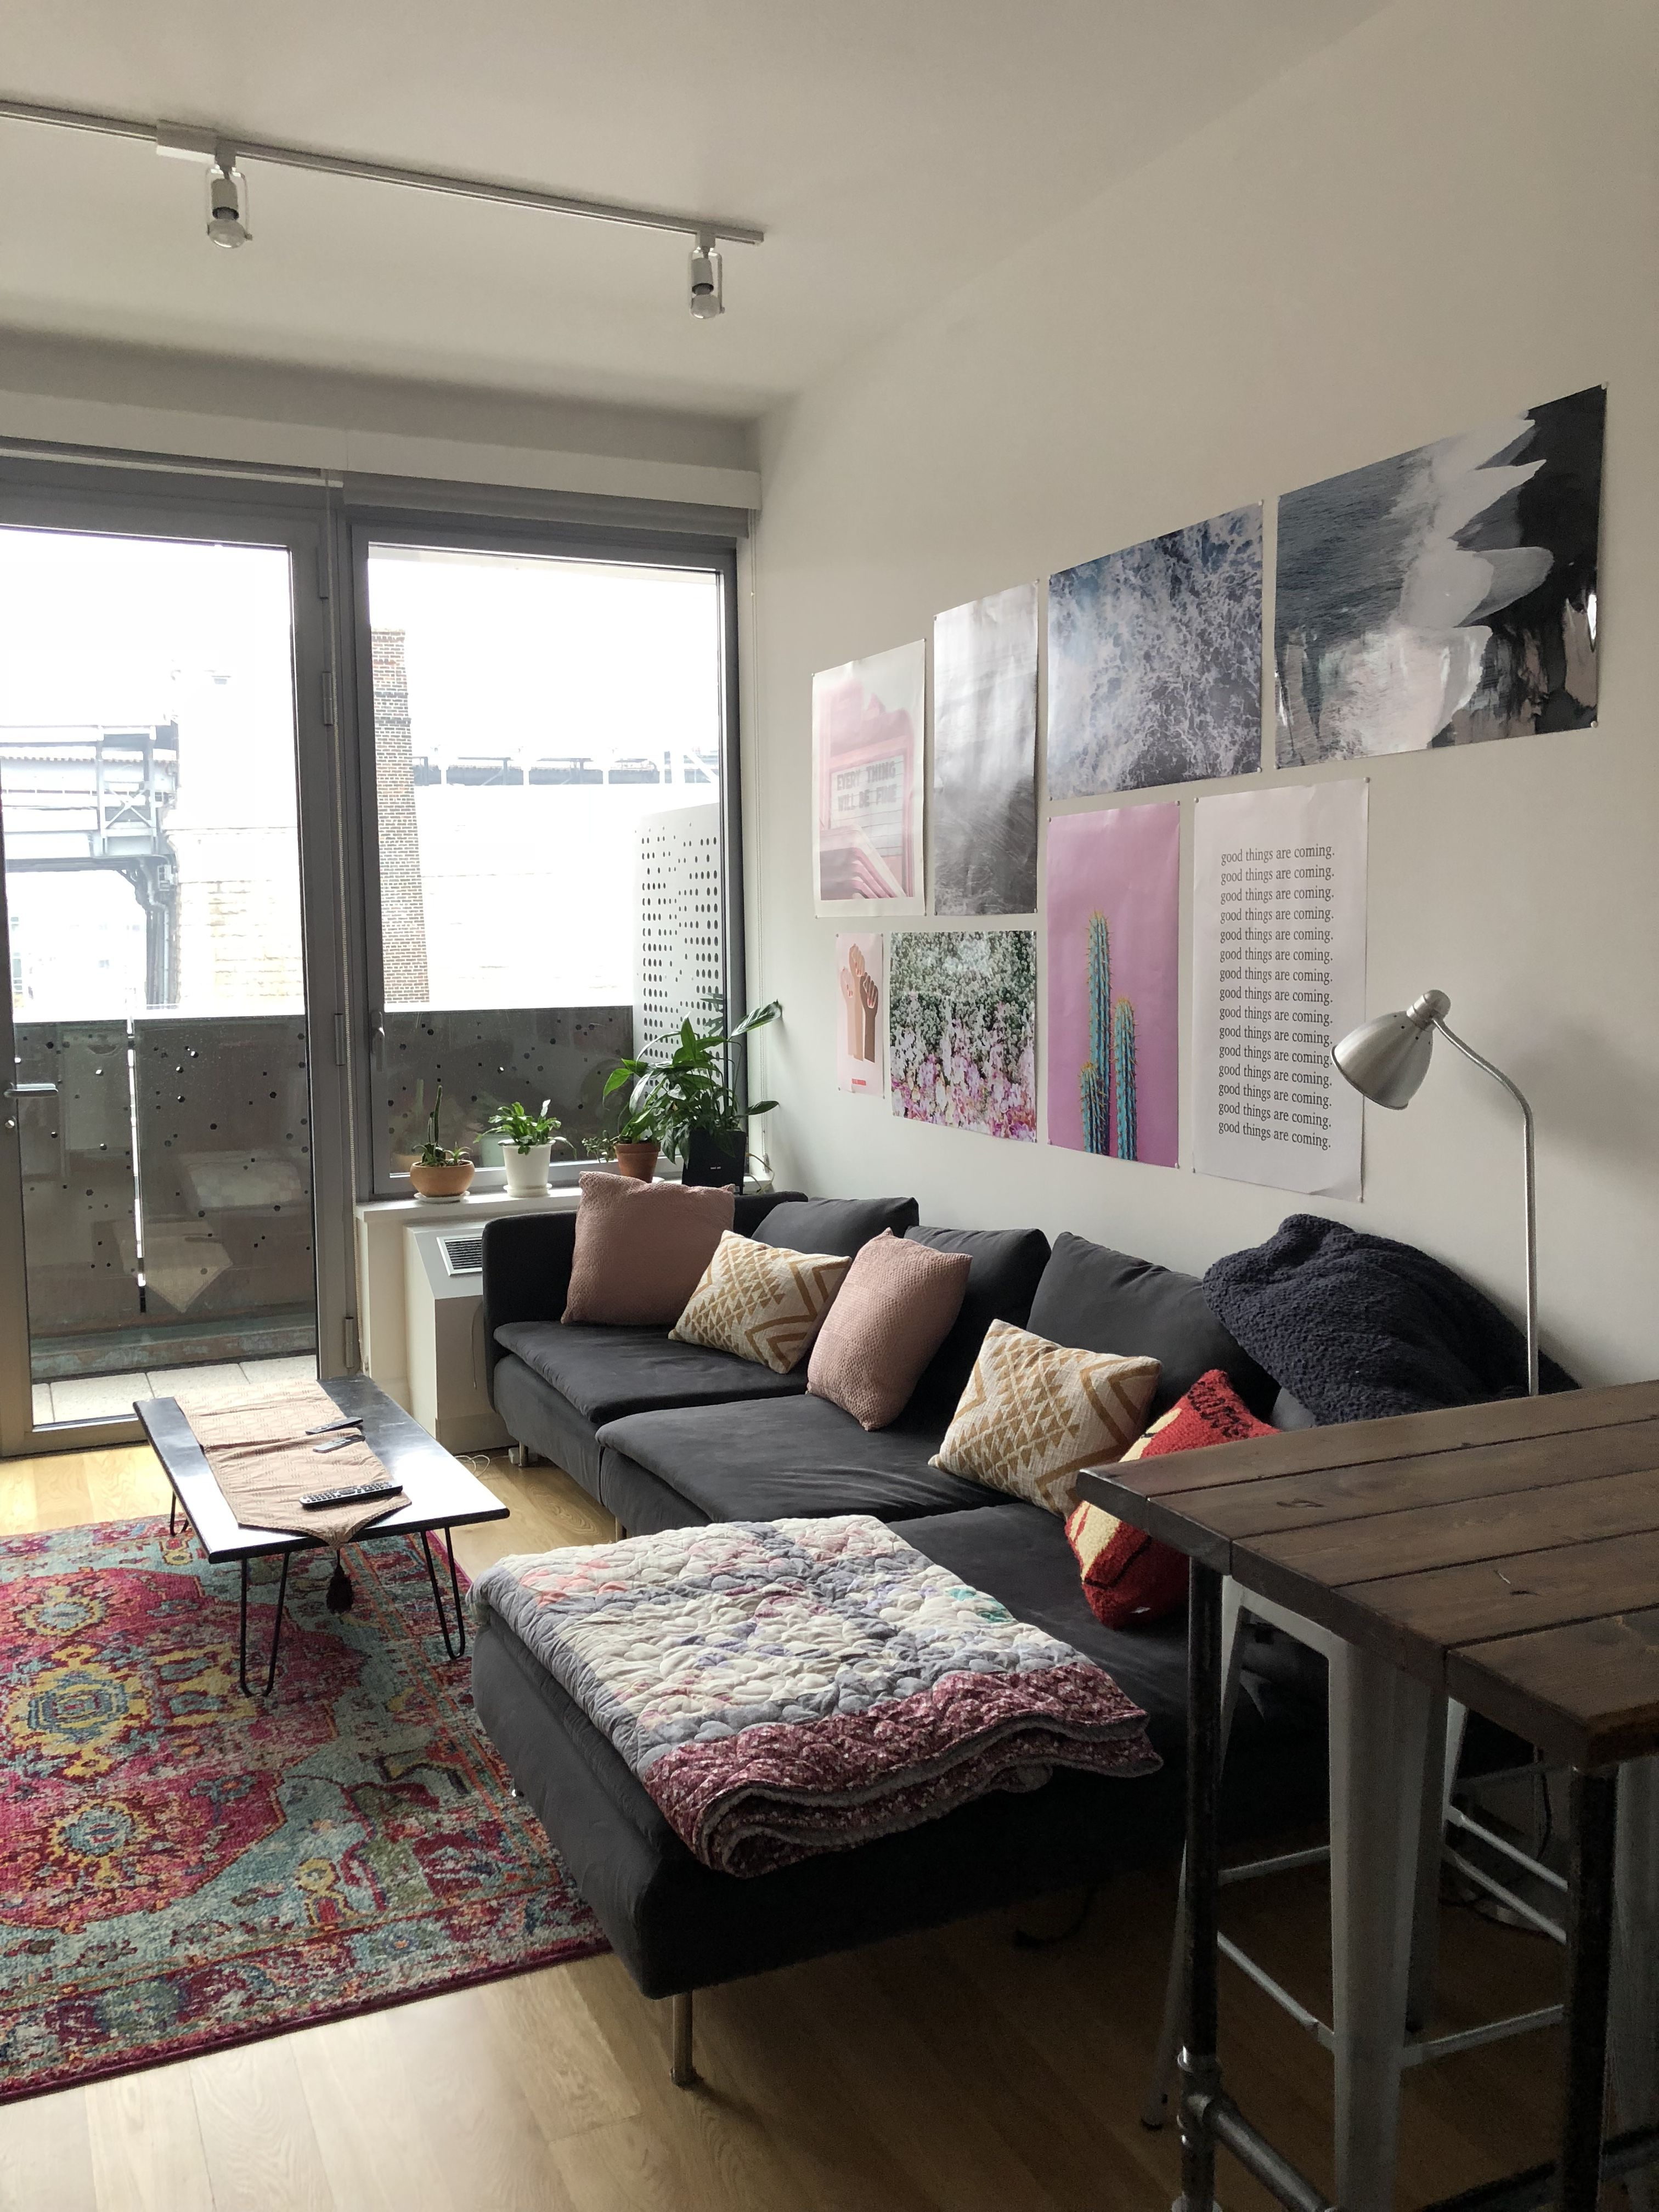 A Boho Minimalist Plant Lady's Brooklyn Rental Decor